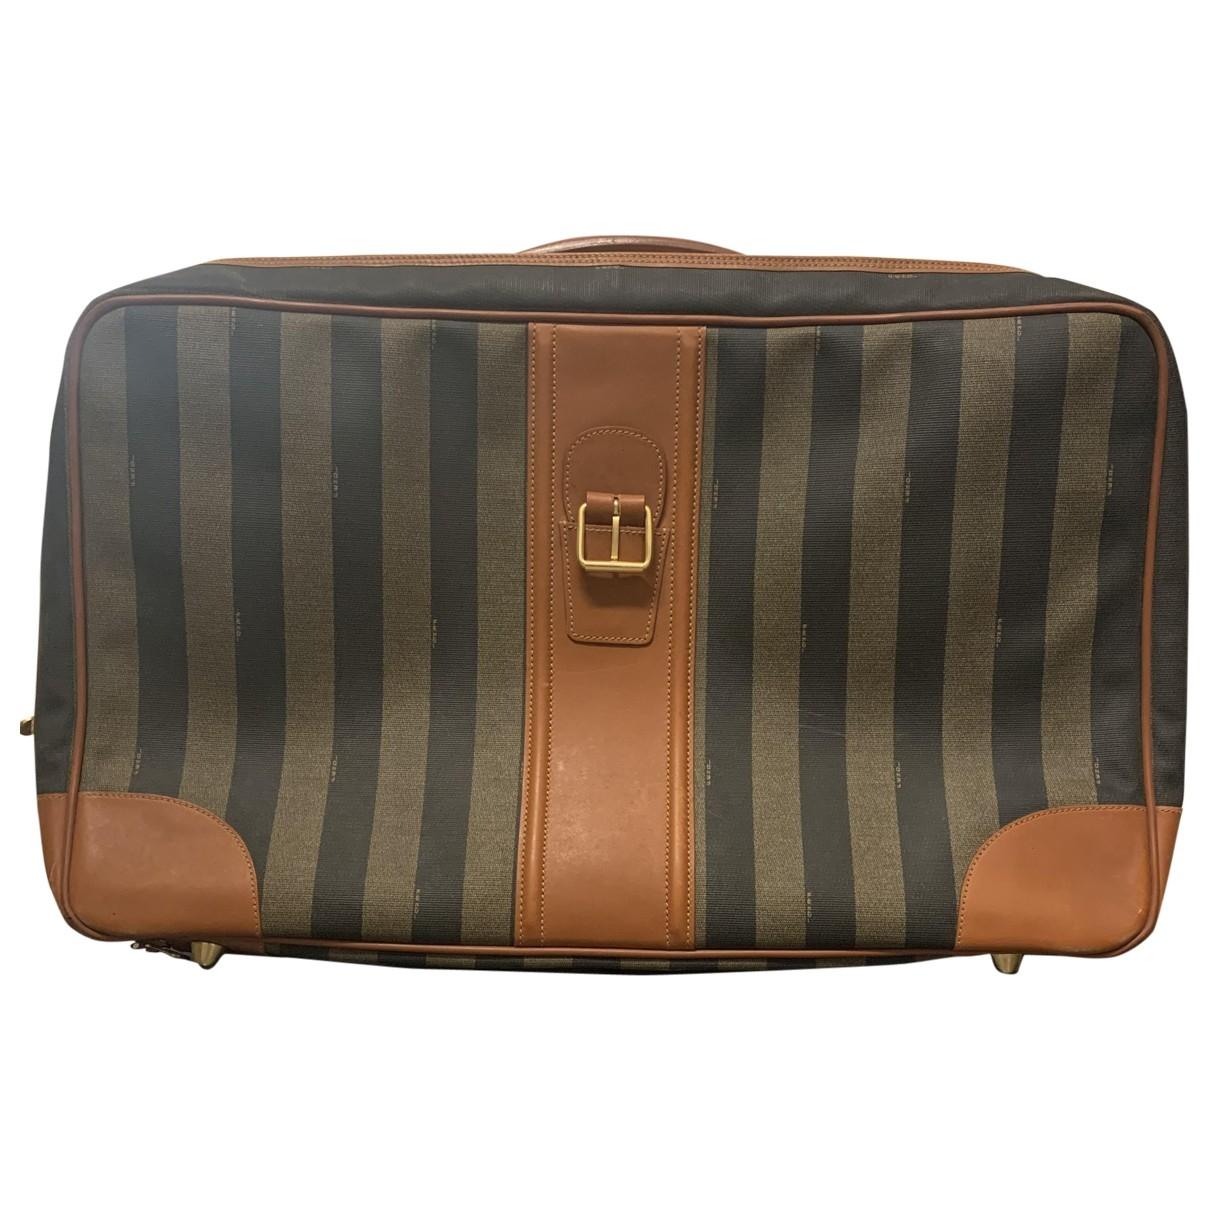 Fendi \N Cloth Travel bag for Women \N